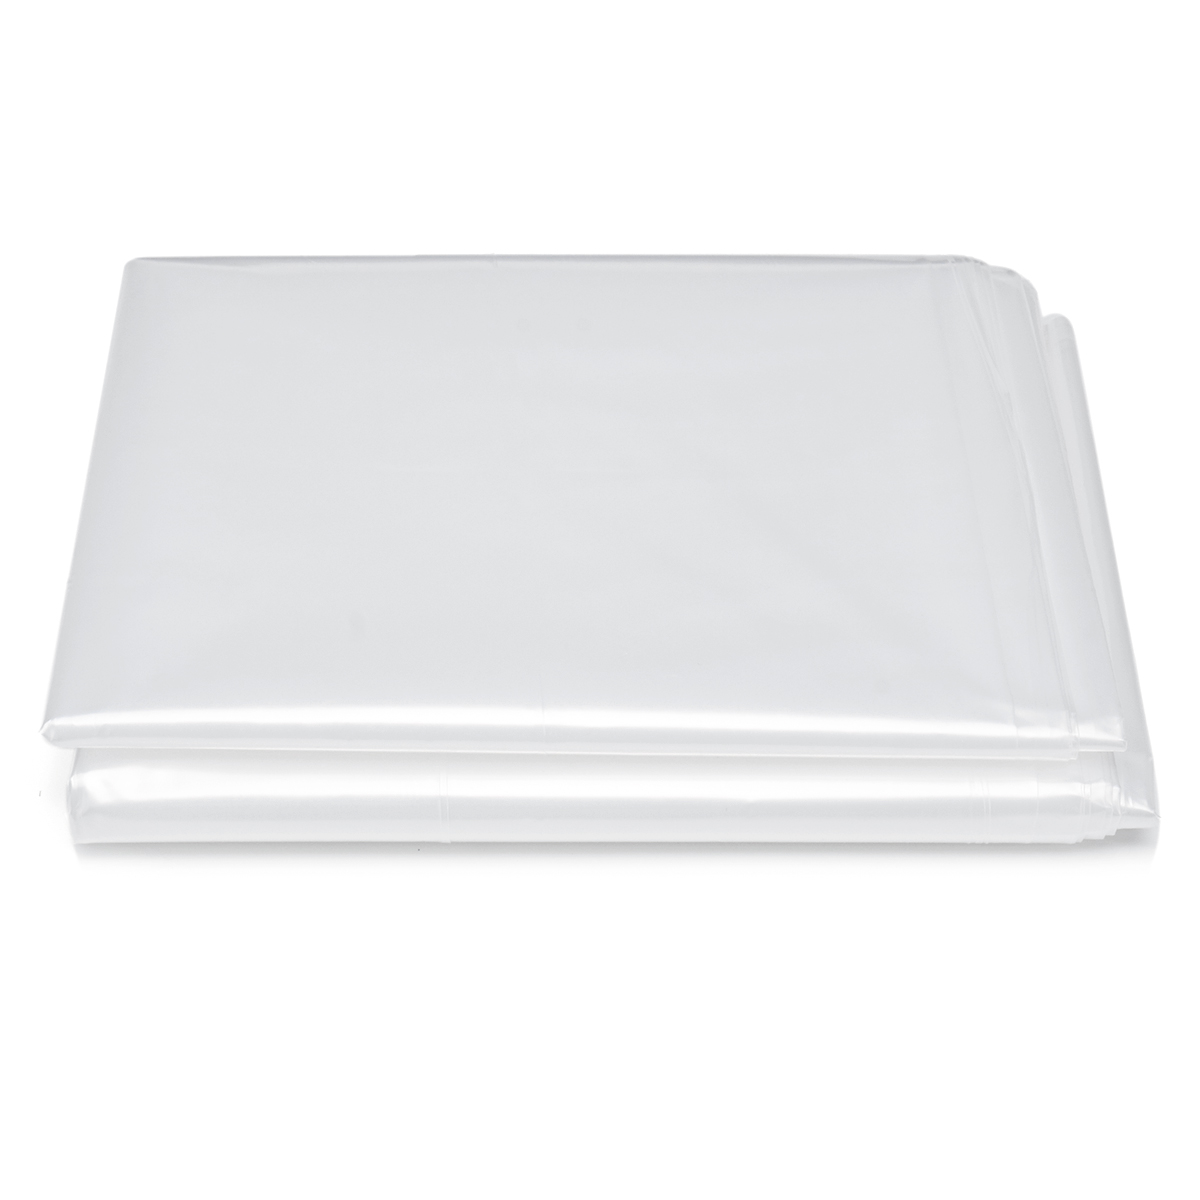 Kadell Mattress Bag Reusable Cover Mattress Protector